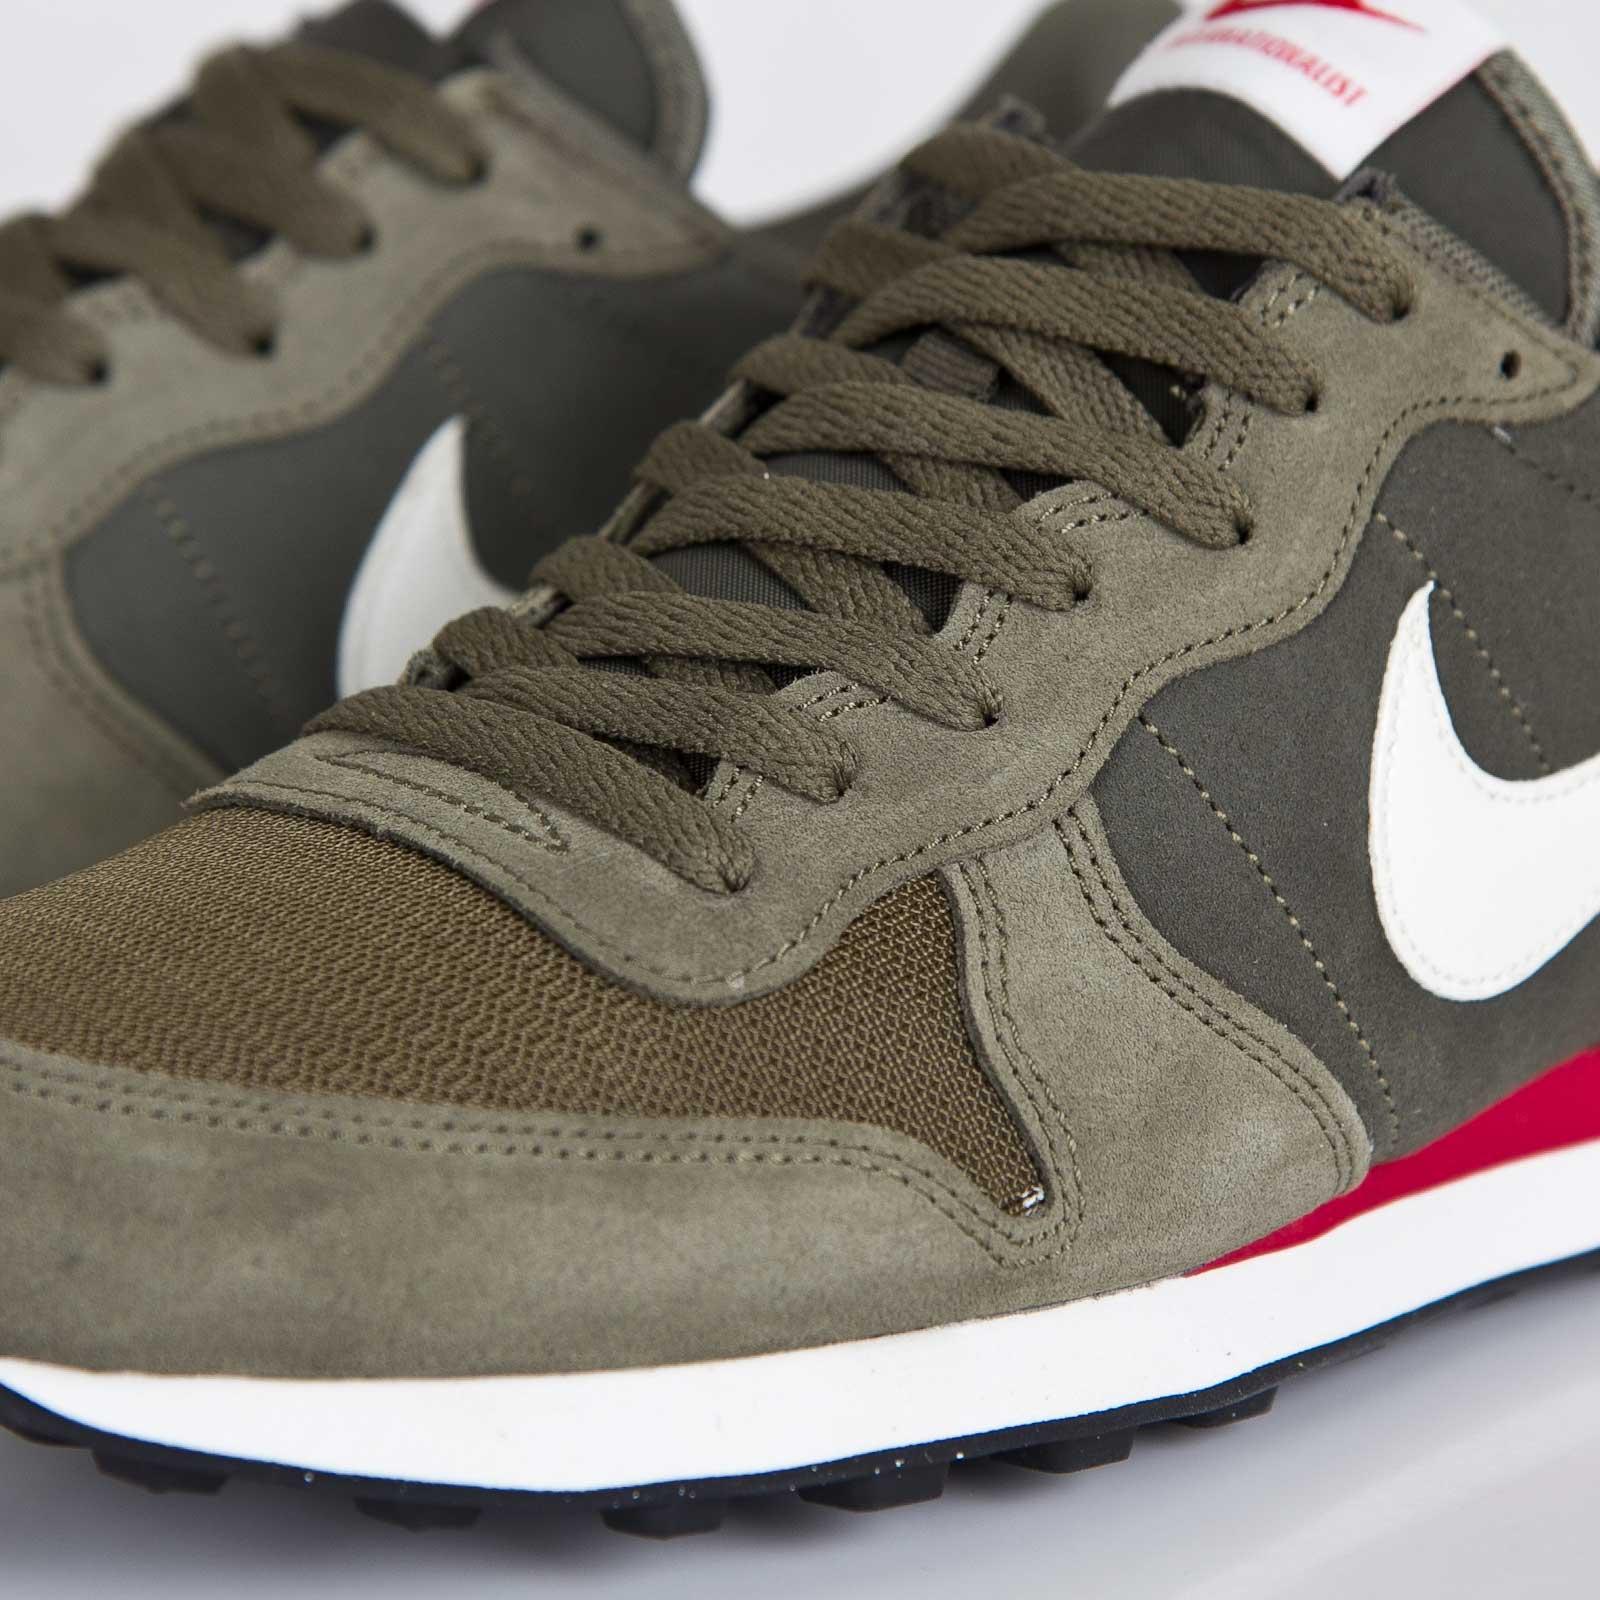 timeless design 3cb41 245f3 ... Nike Internationalist Leather ...